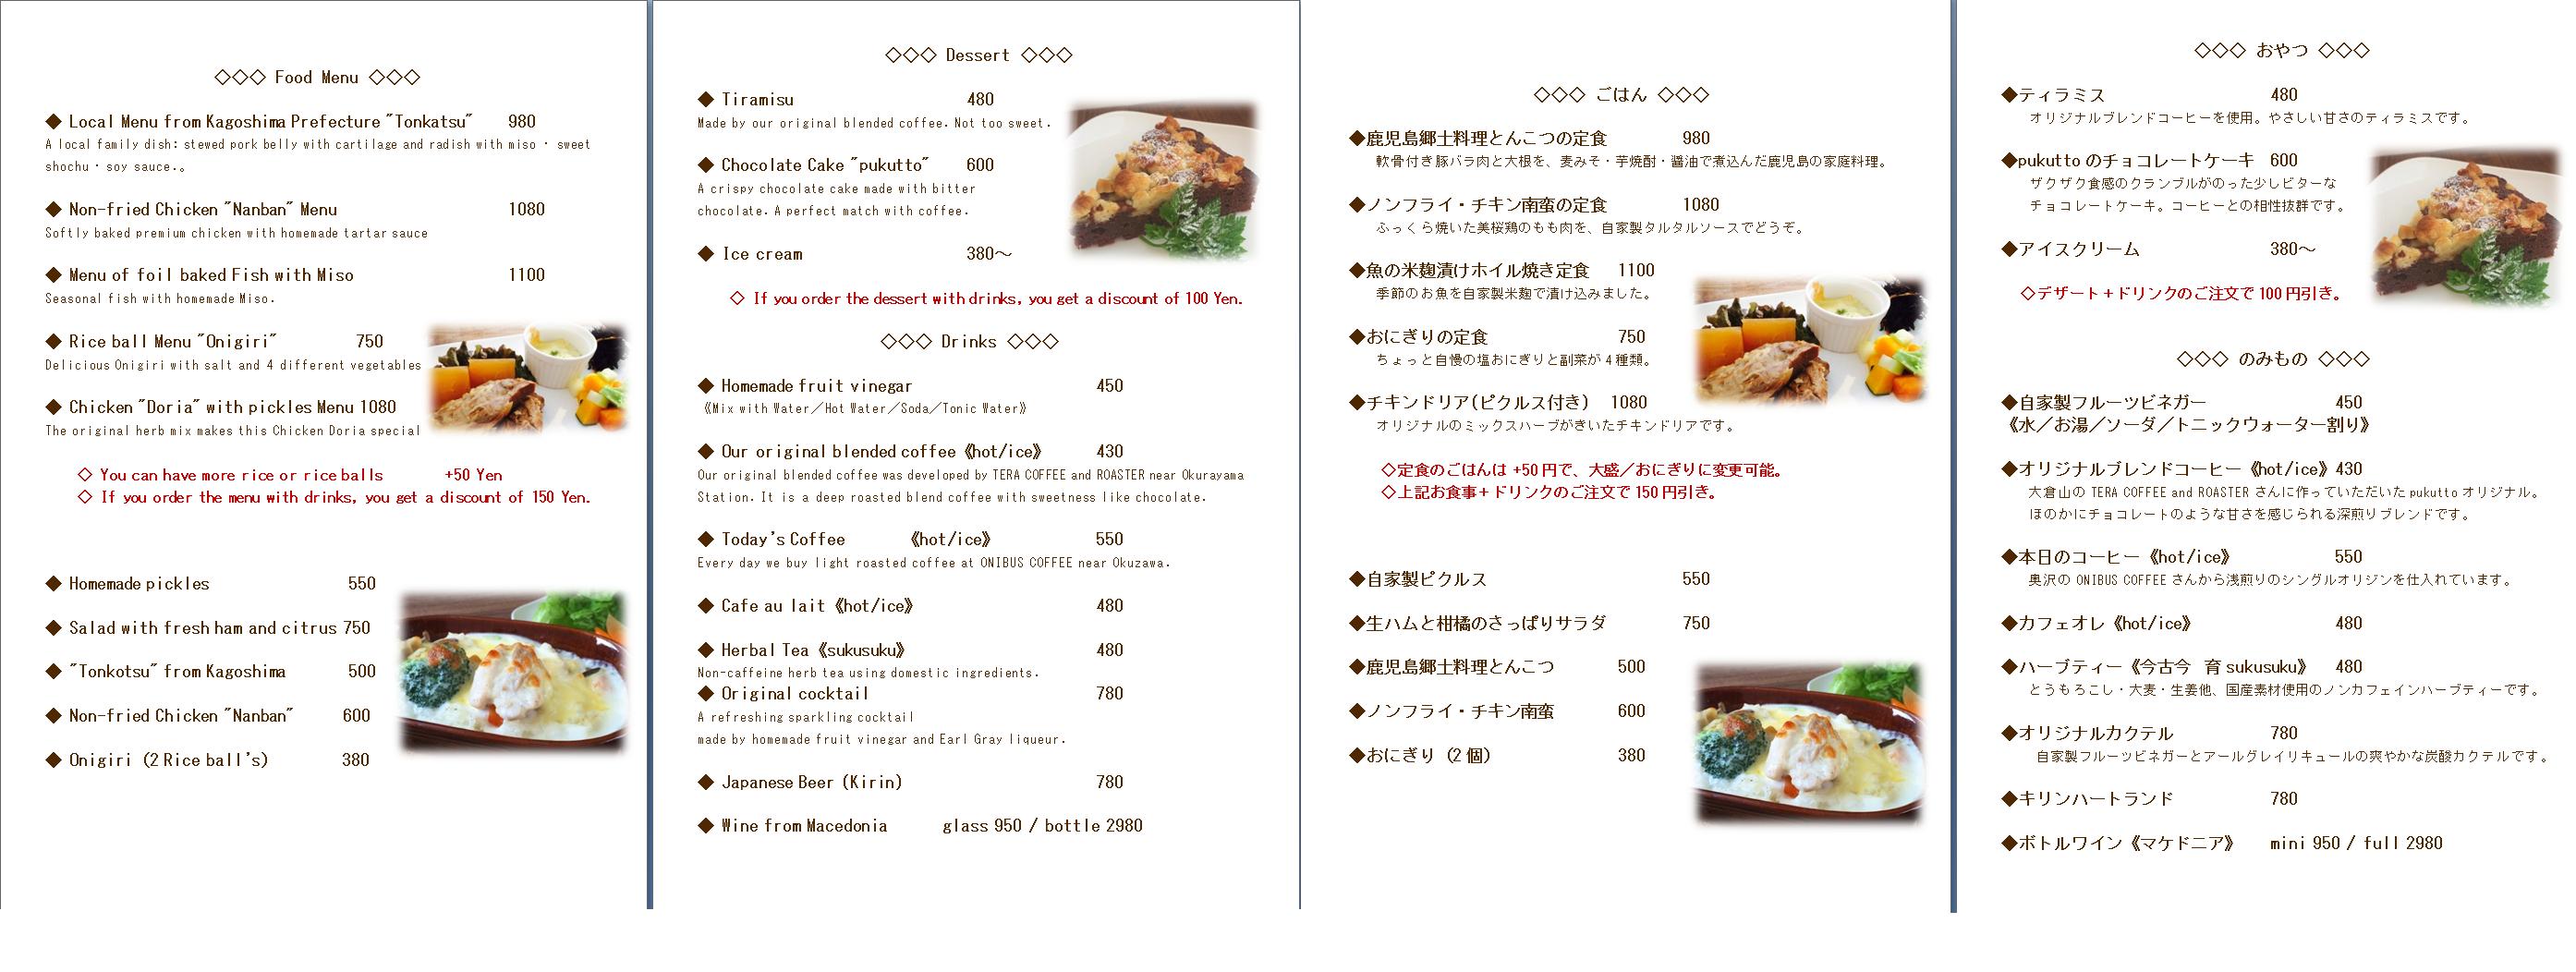 Sample Translation (Restaurant Menu)